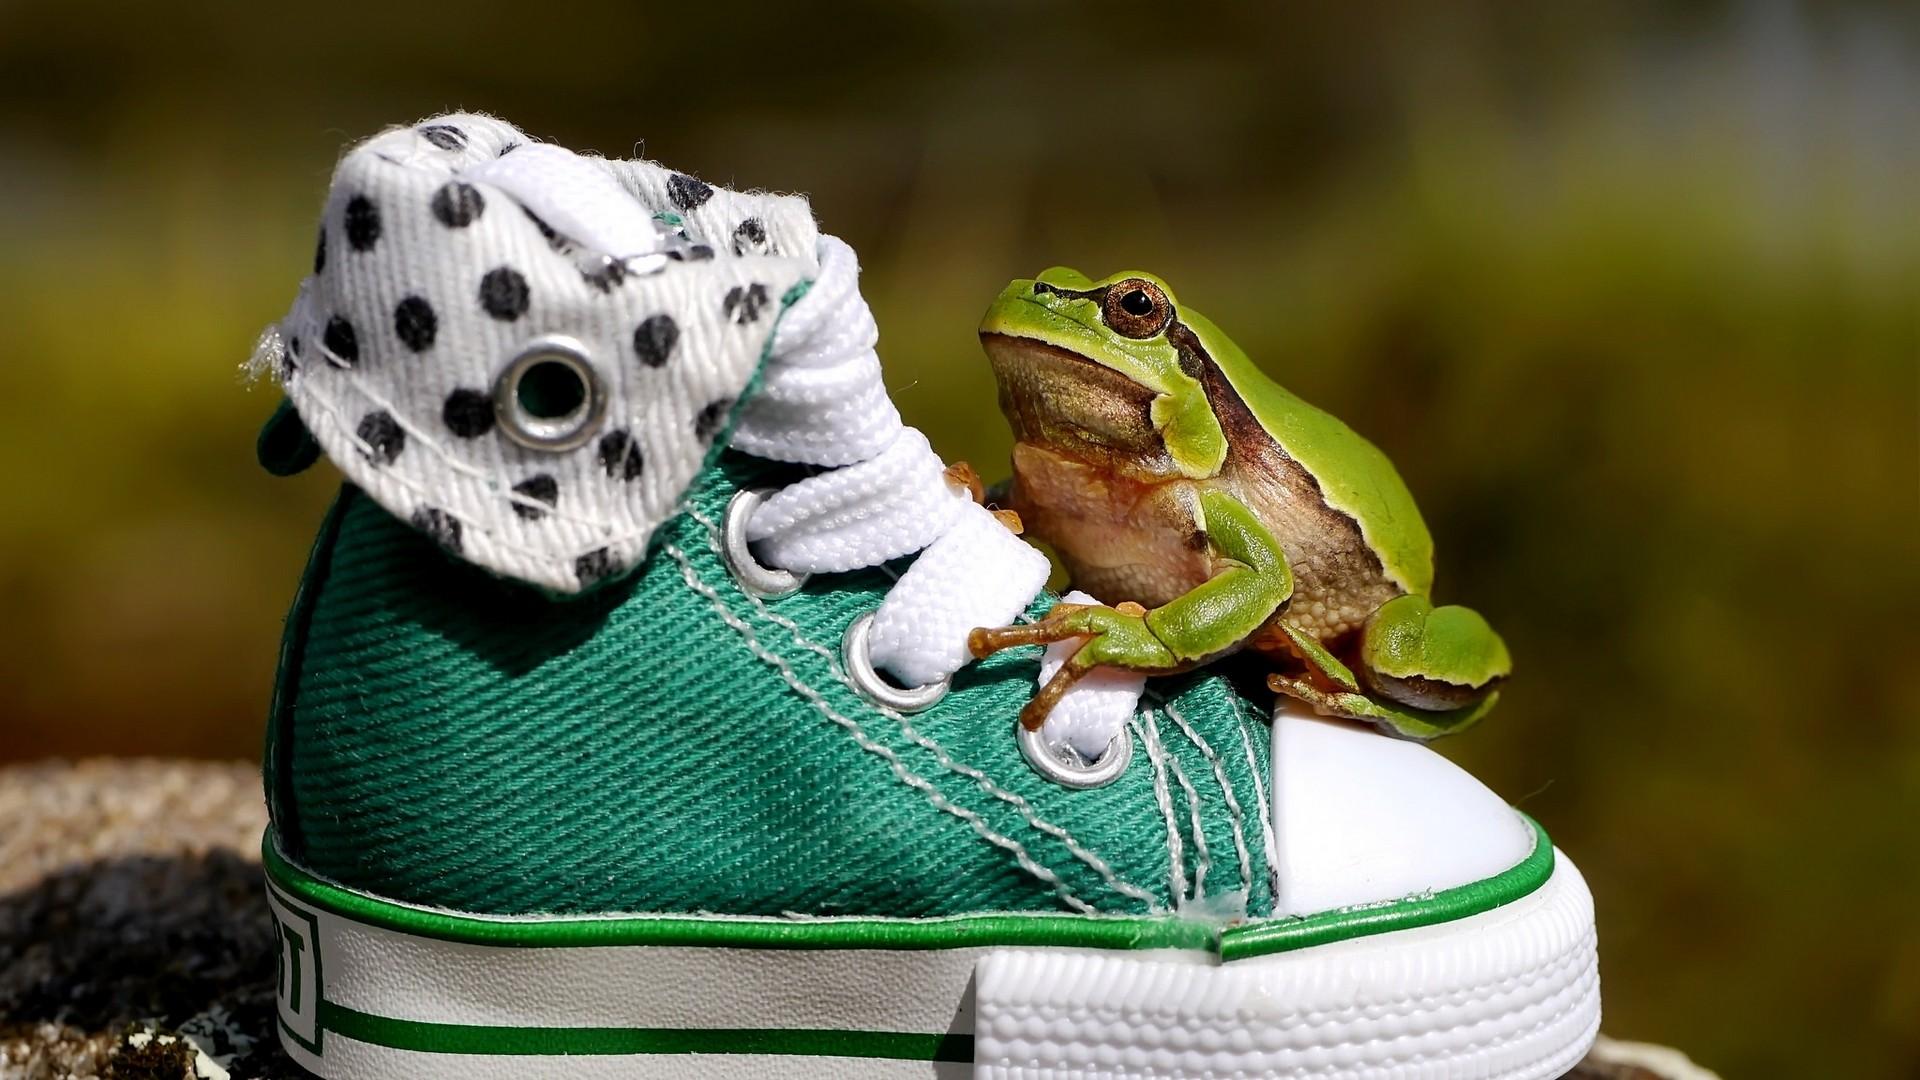 Frog computer wallpaper